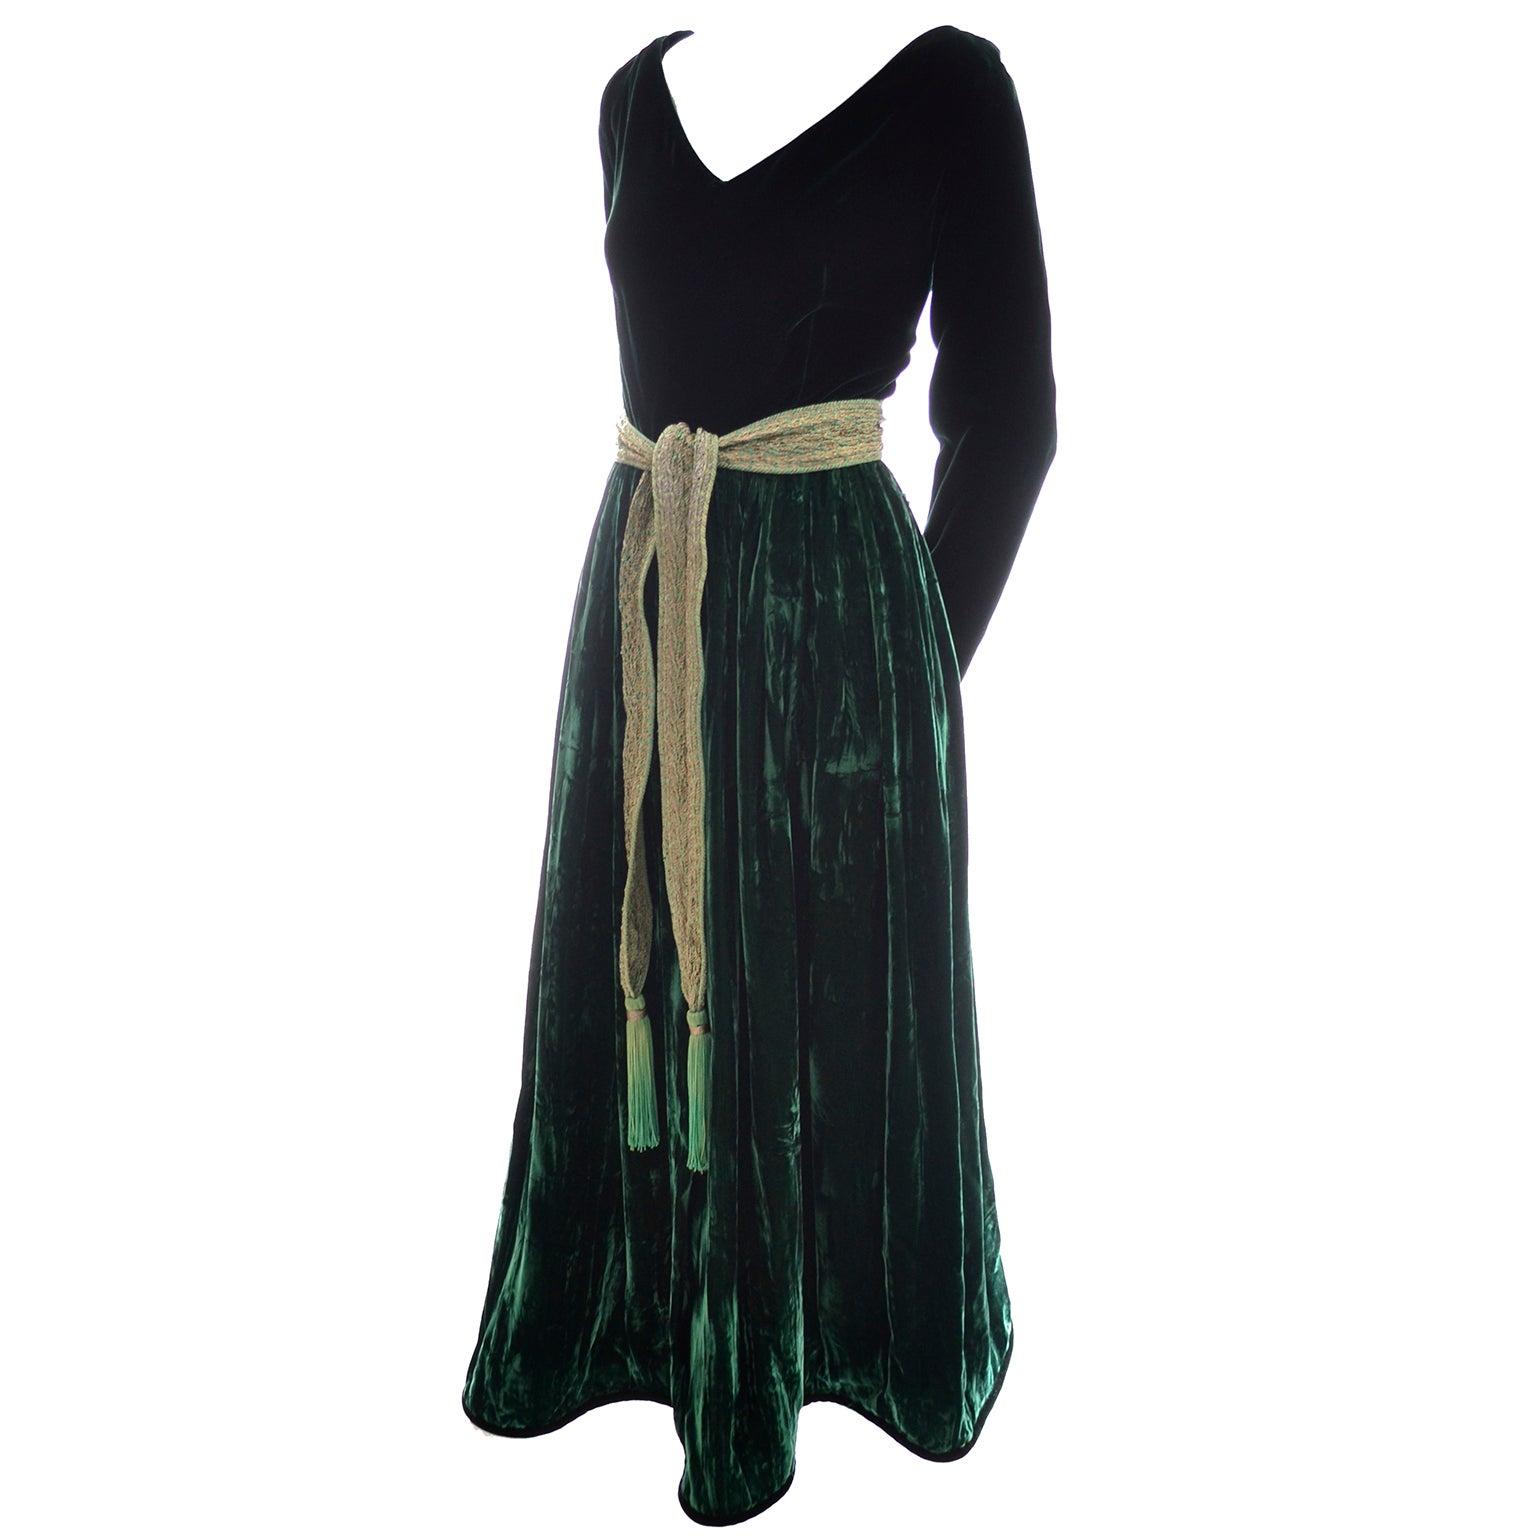 Oscar de la Renta dark green velvet dress For Sale at 1stdibs